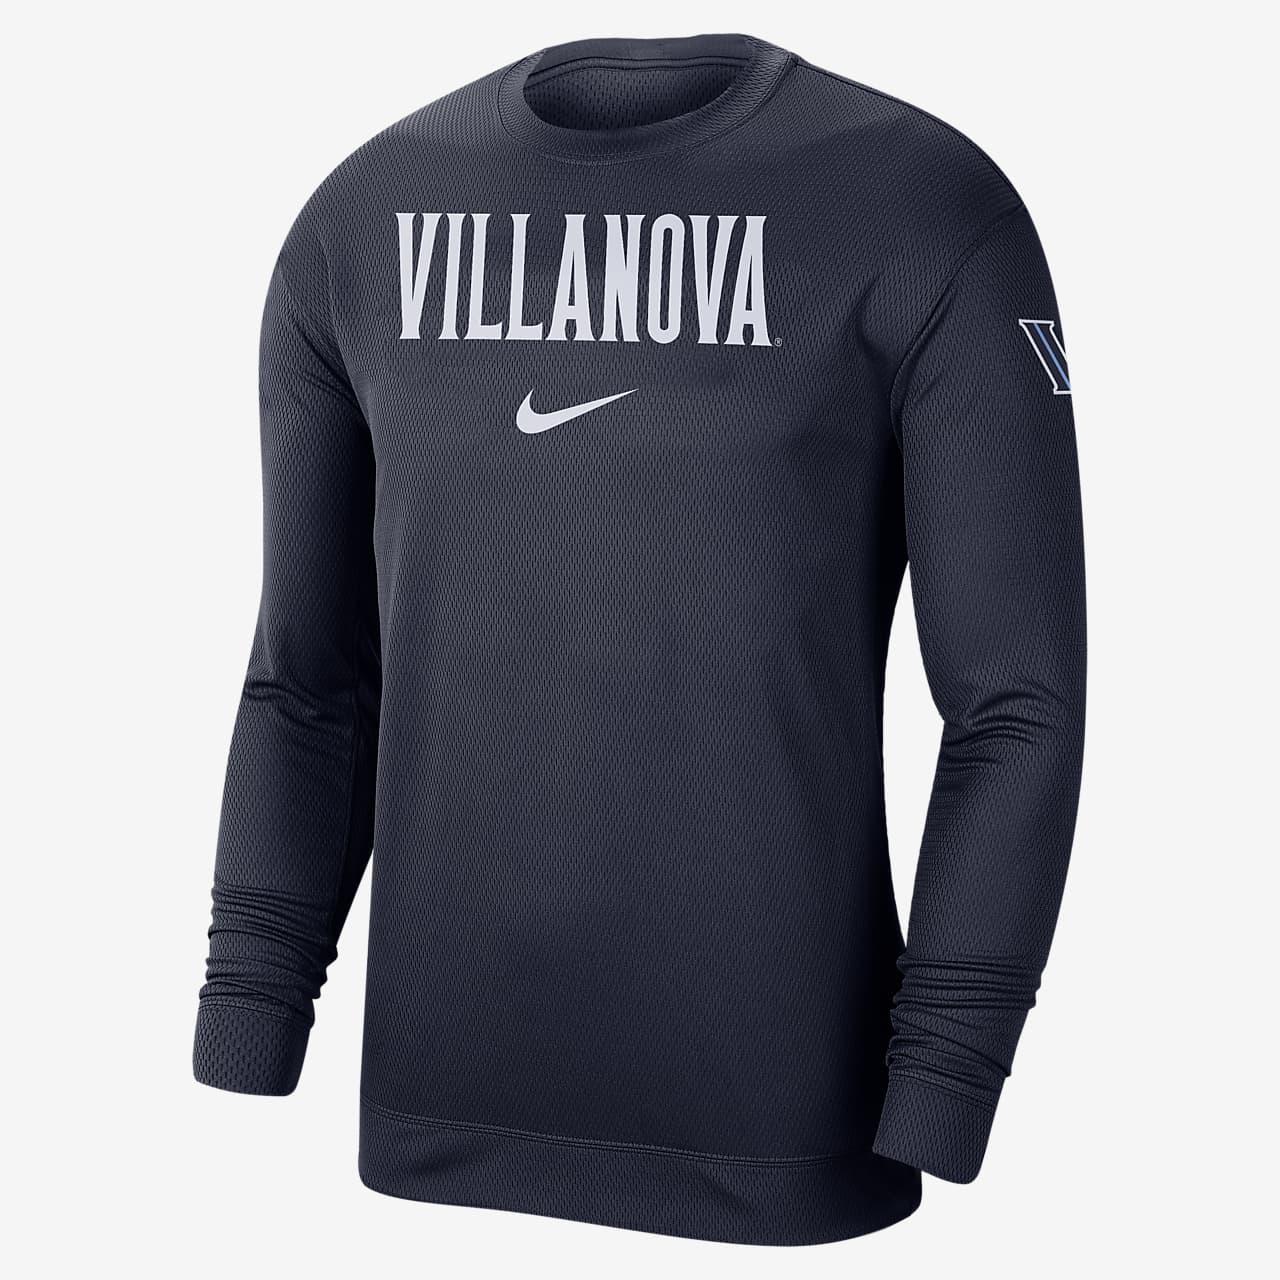 Nike College Dri-FIT Spotlight (Villanova) Men's Long-Sleeve Top